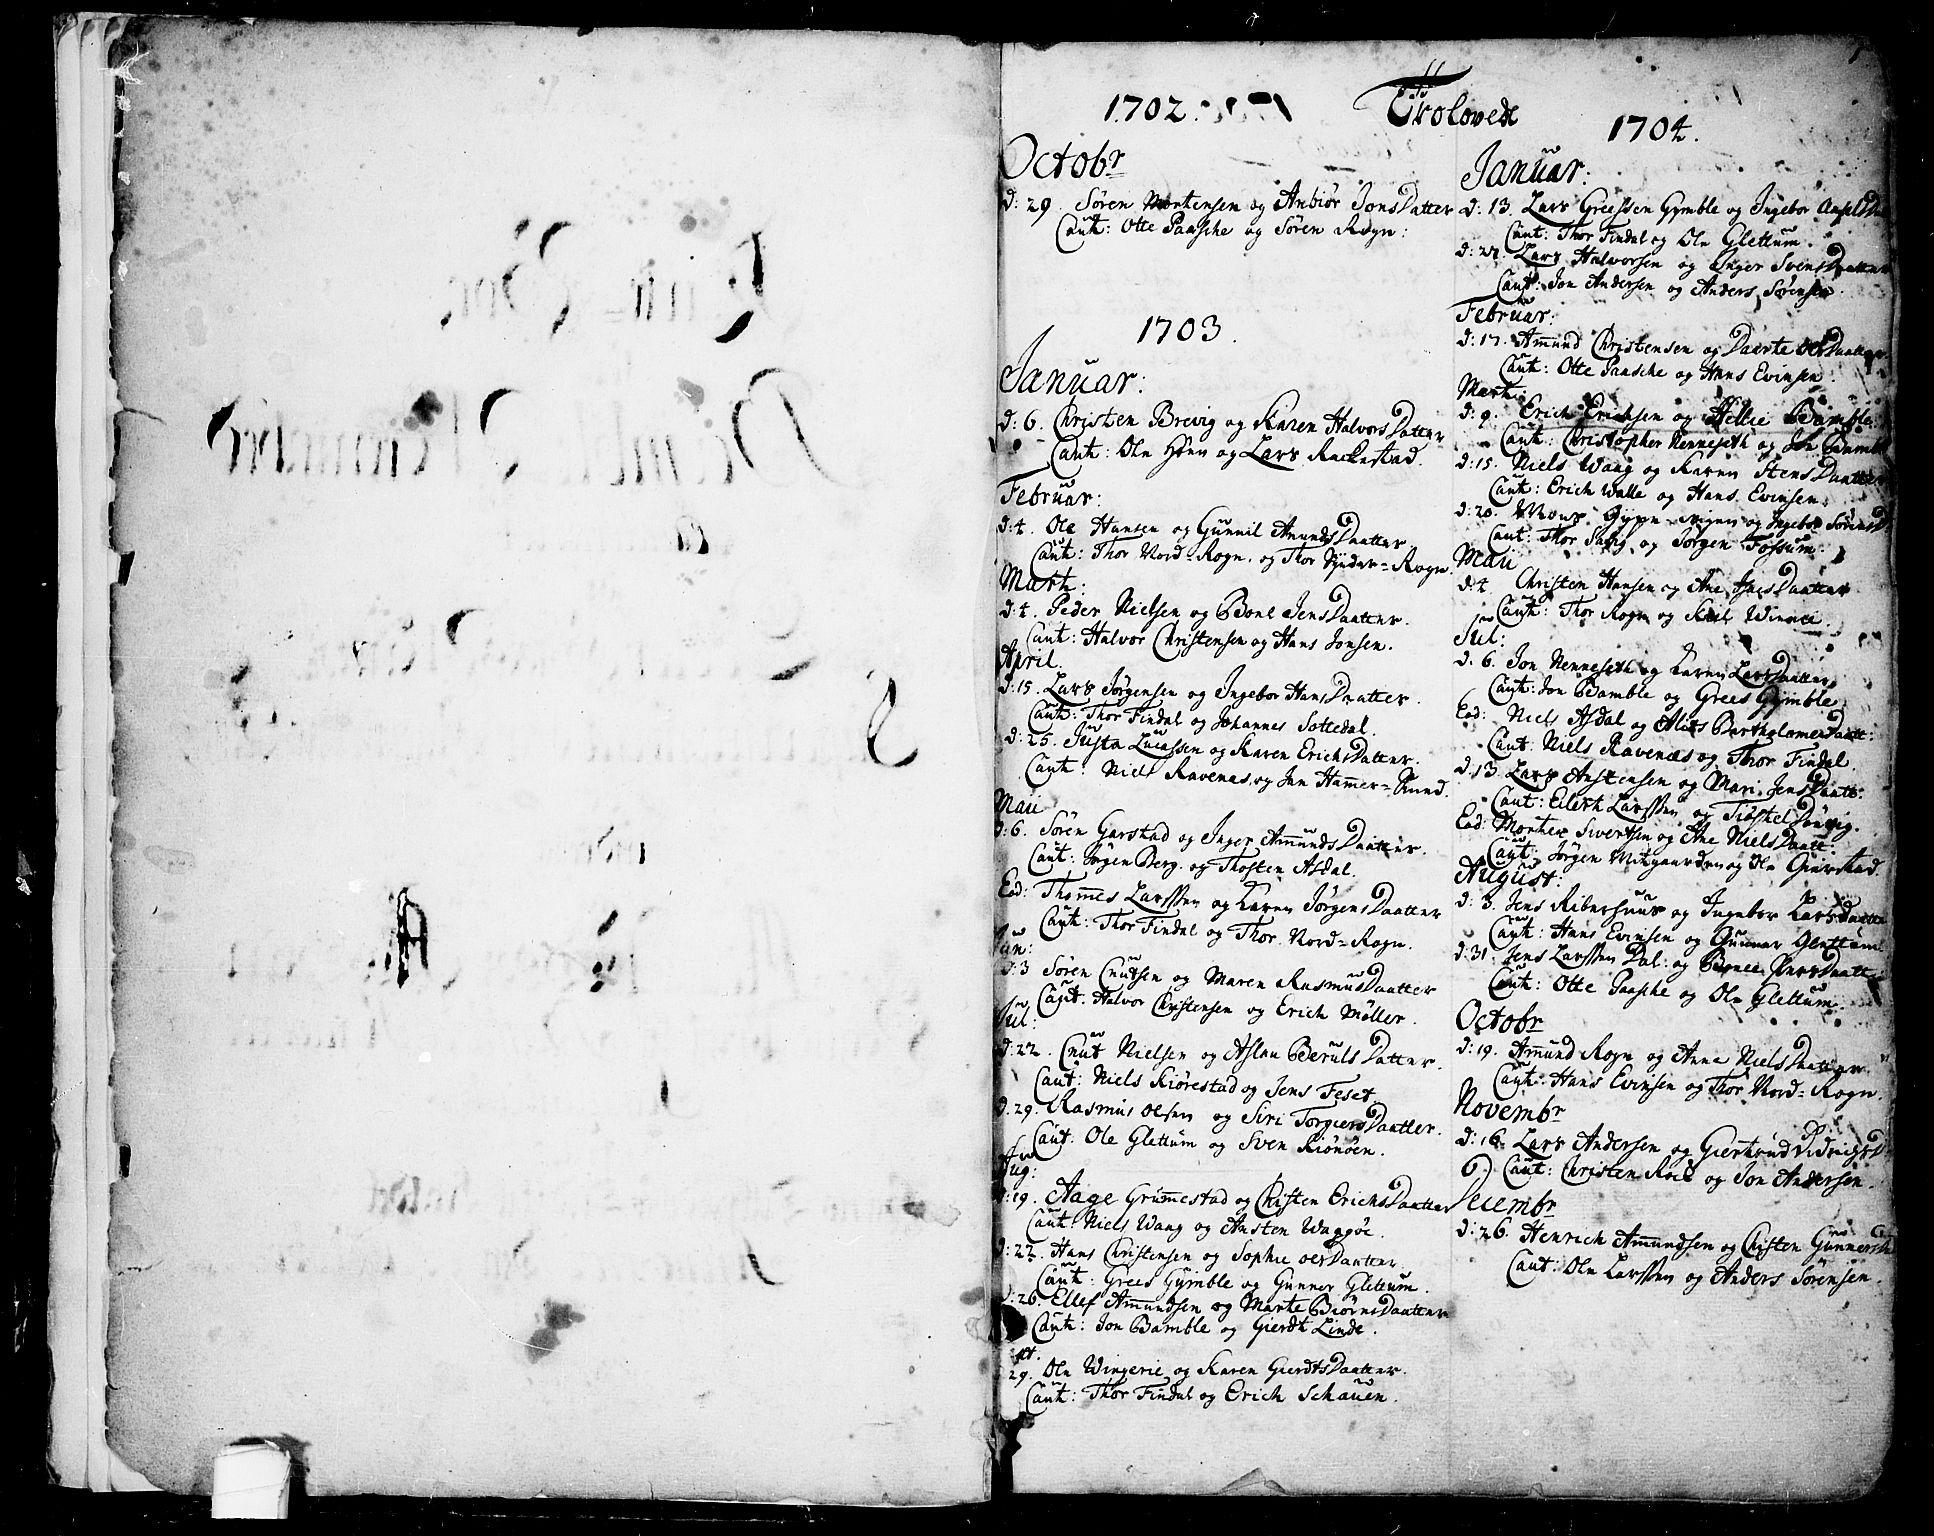 SAKO, Bamble kirkebøker, F/Fa/L0001: Ministerialbok nr. I 1, 1702-1774, s. 0-1